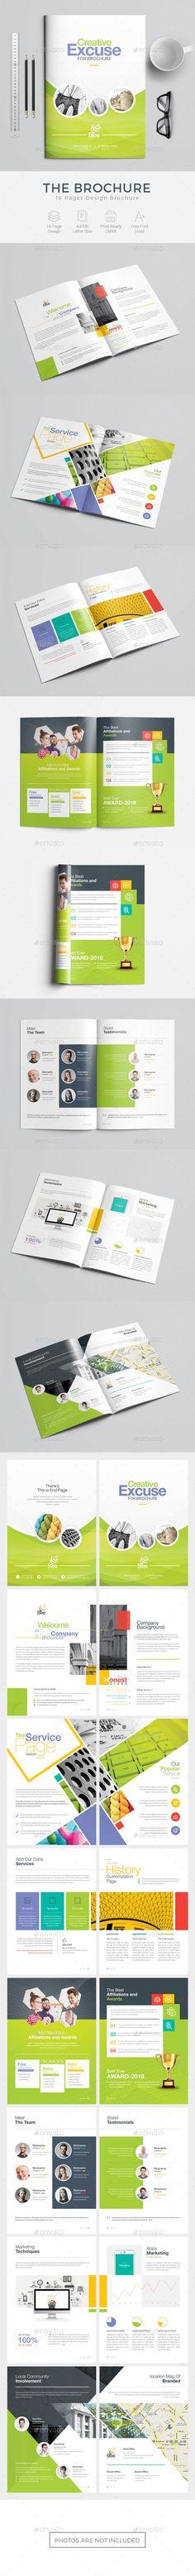 Brochure Template PSD - Download: https://graphicriver.net/item/brochure/21754495?ref=ksioks